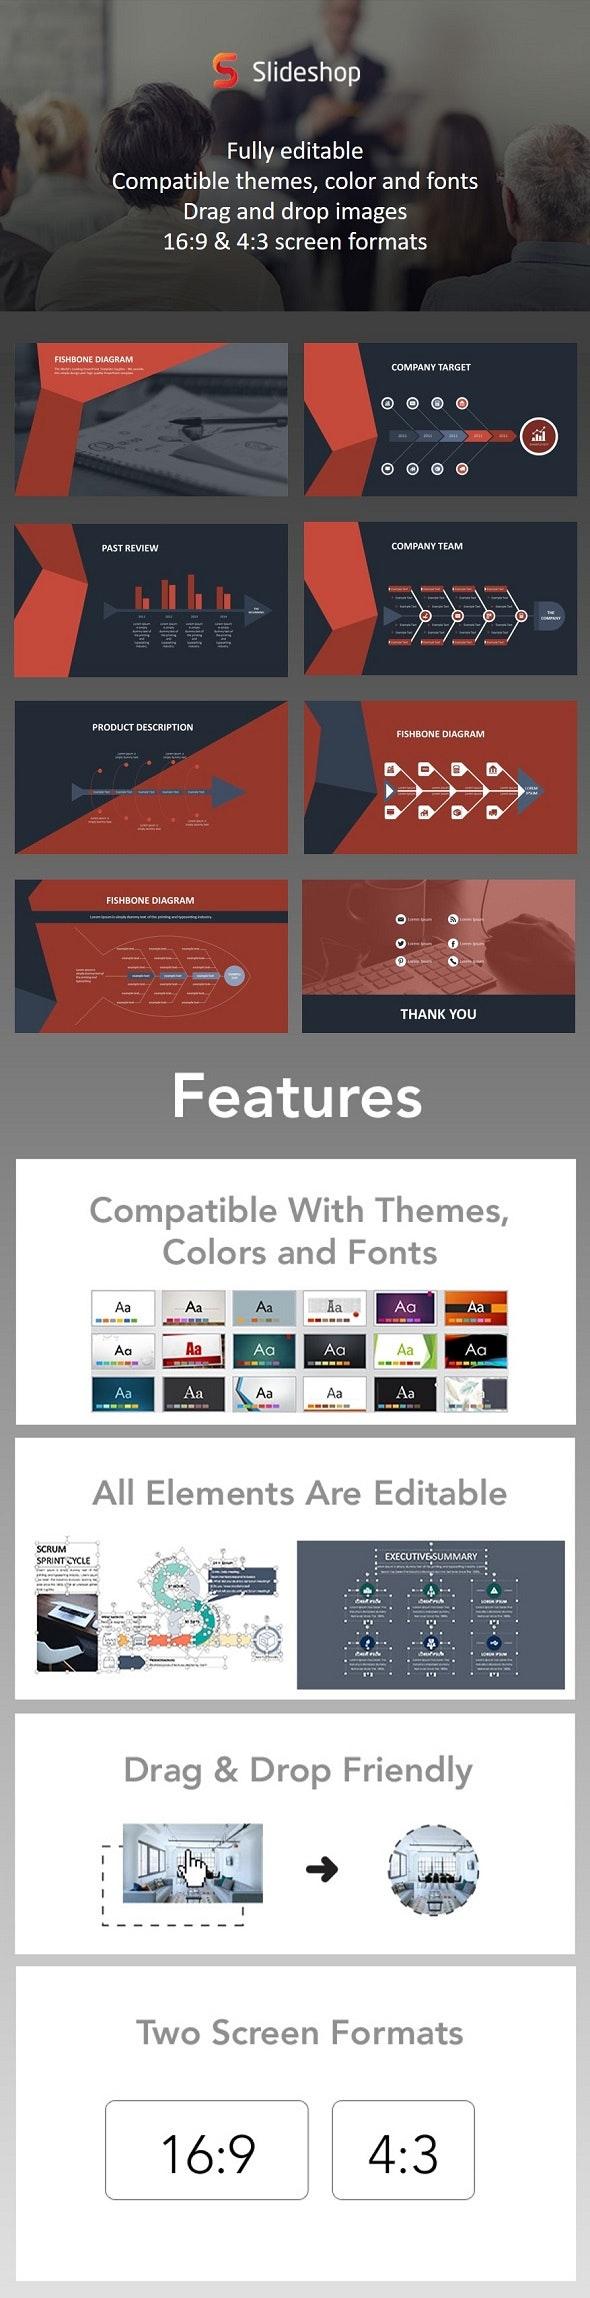 Fishbone Diagram Animation Red - PowerPoint Templates Presentation Templates